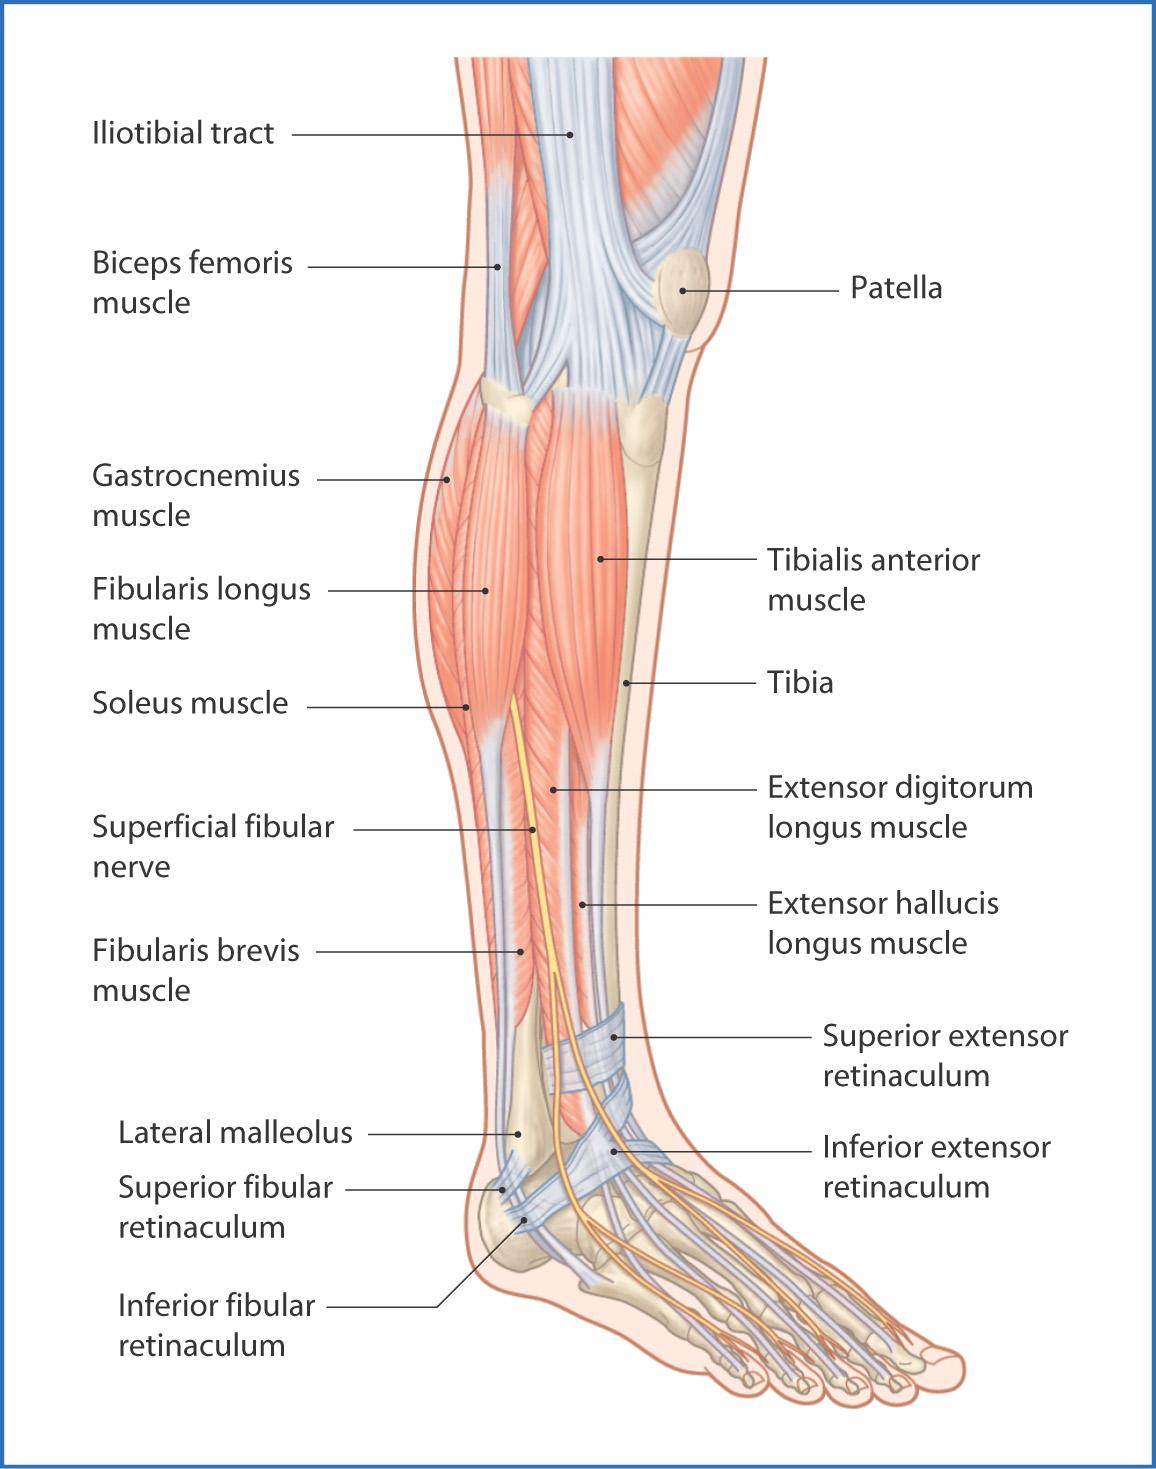 Anterolateral Leg | Basicmedical Key